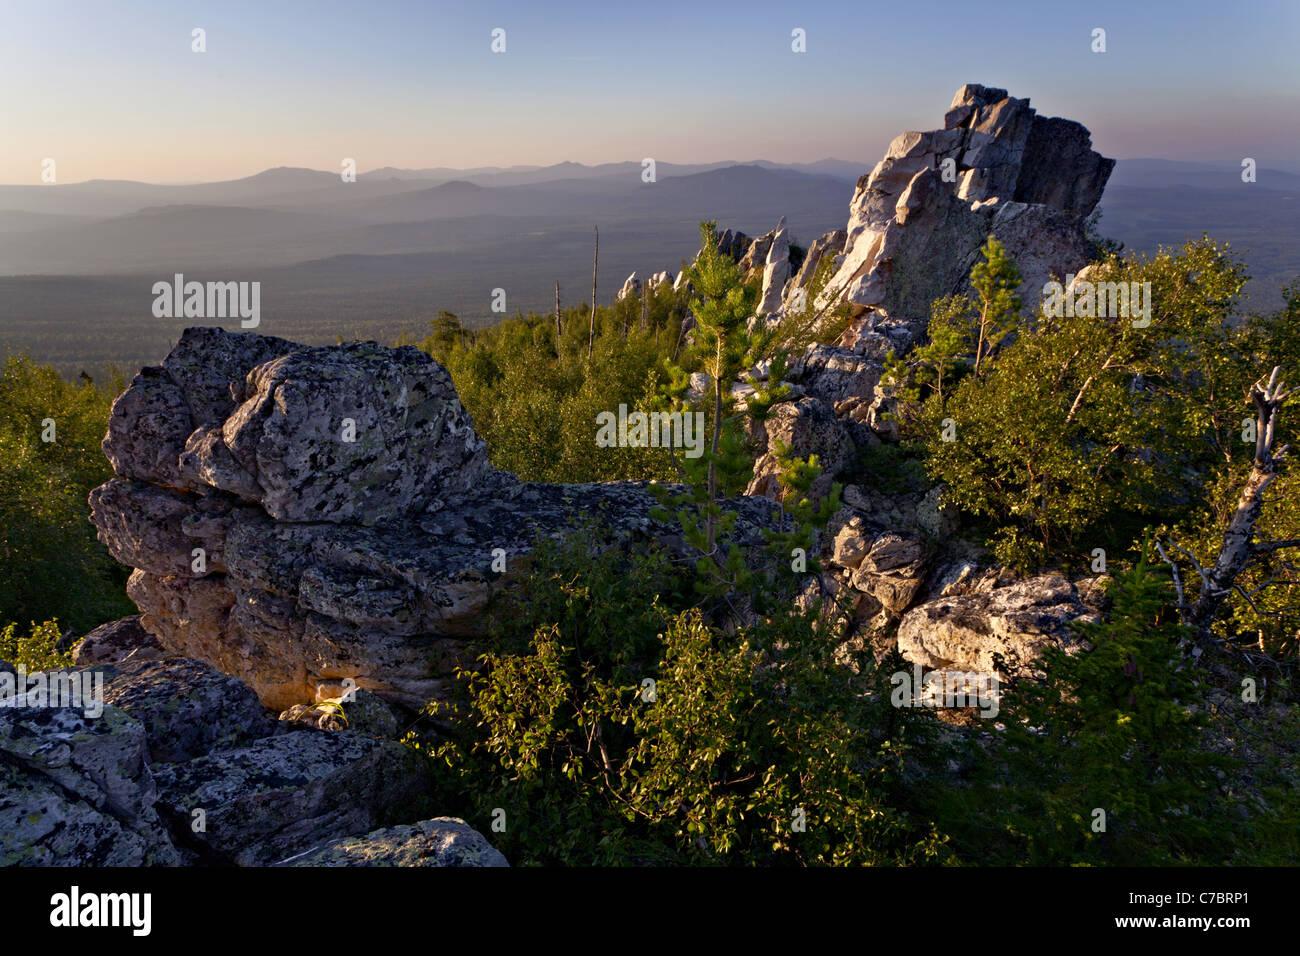 Rocks in sunset illimination, Urals, Russia - Stock Image